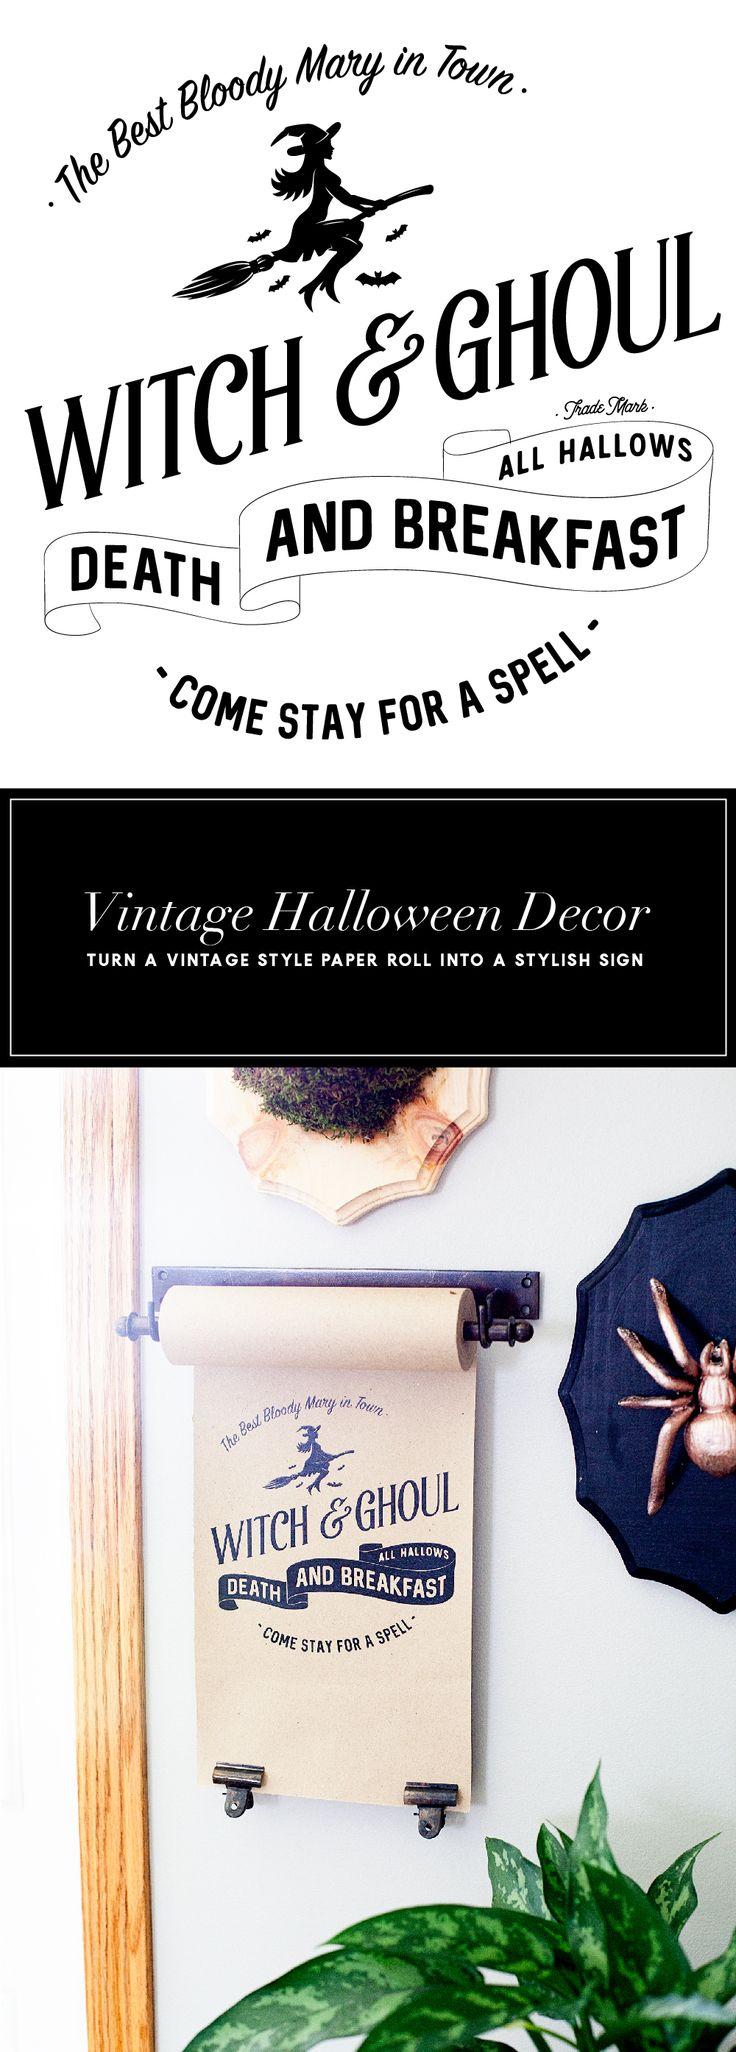 DIY Decorative Halloween Paper Roll - Cute Halloween Decorations